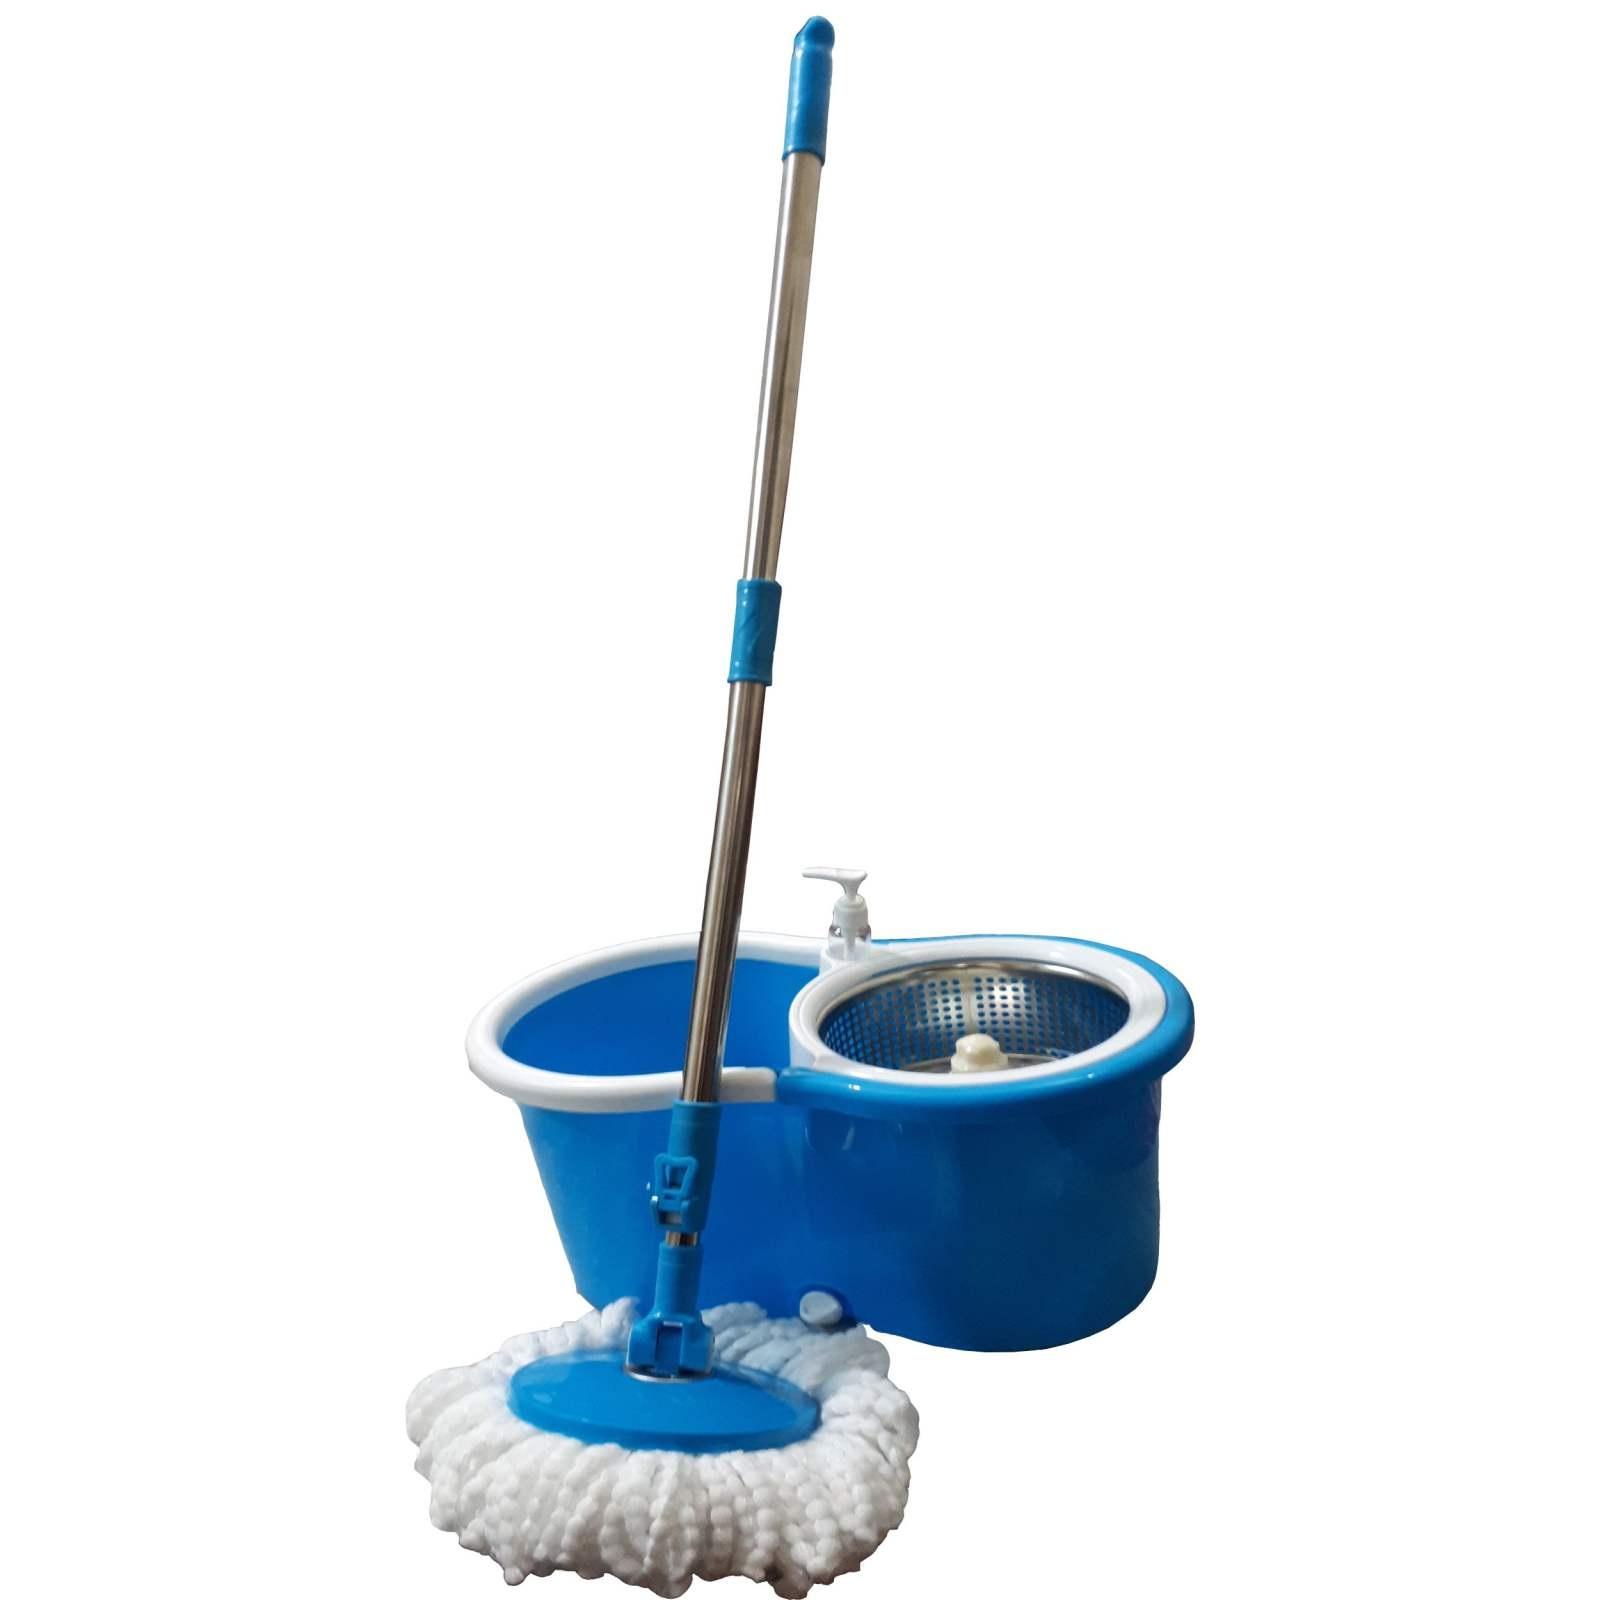 سطل و زمین شوی مدل Magic Mop